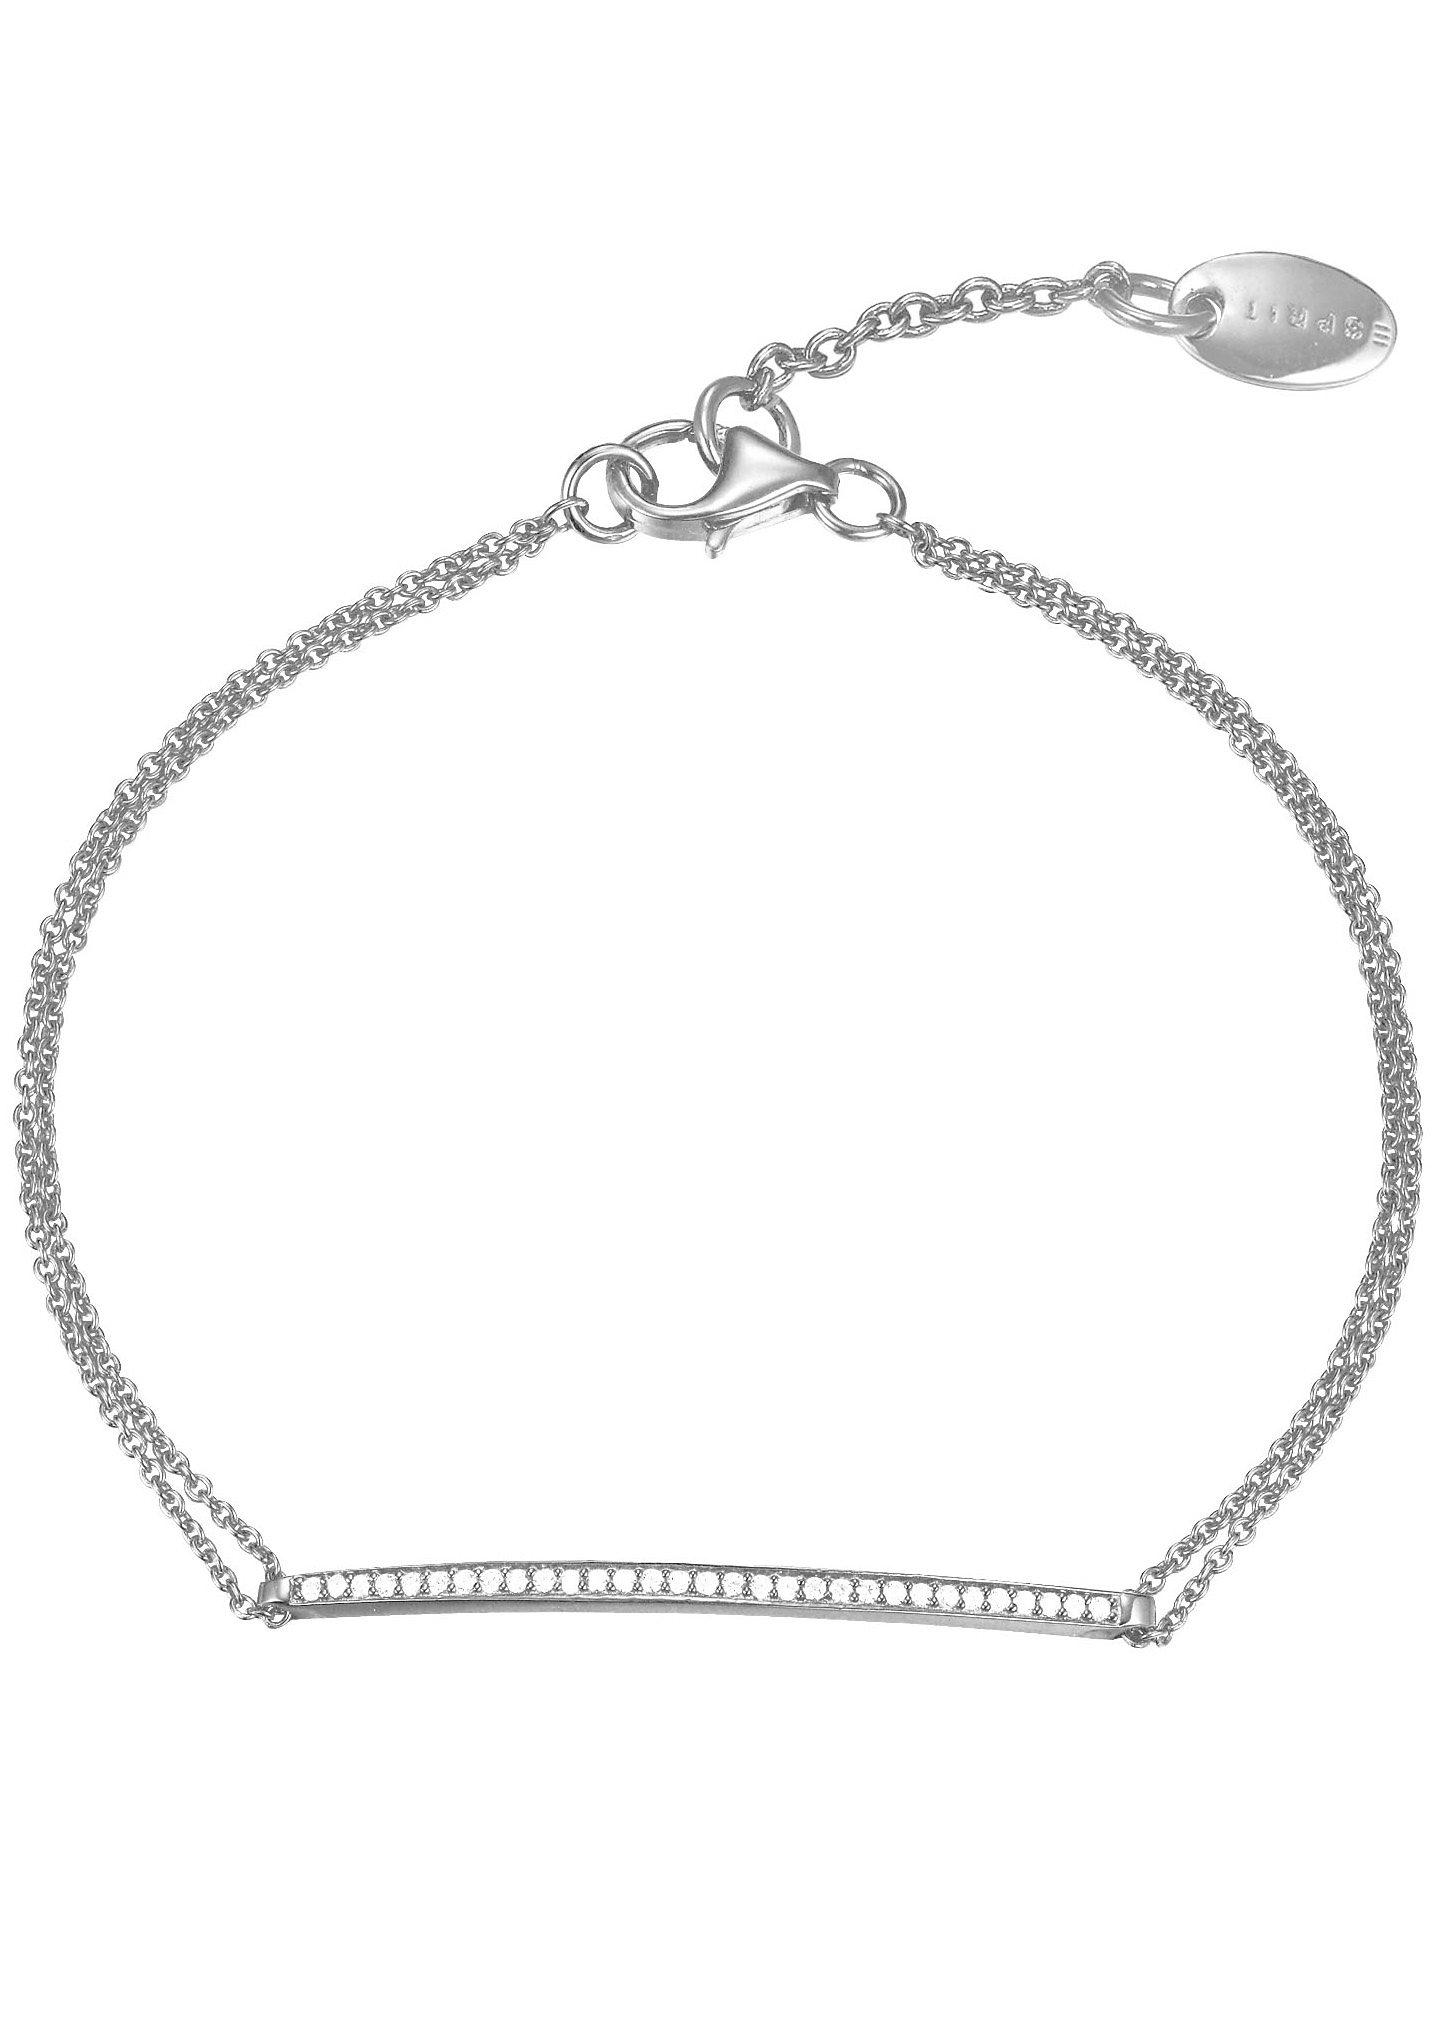 Esprit Armband mit Zirkonia, »ESPRIT-JW50217, ESBR91786A160«